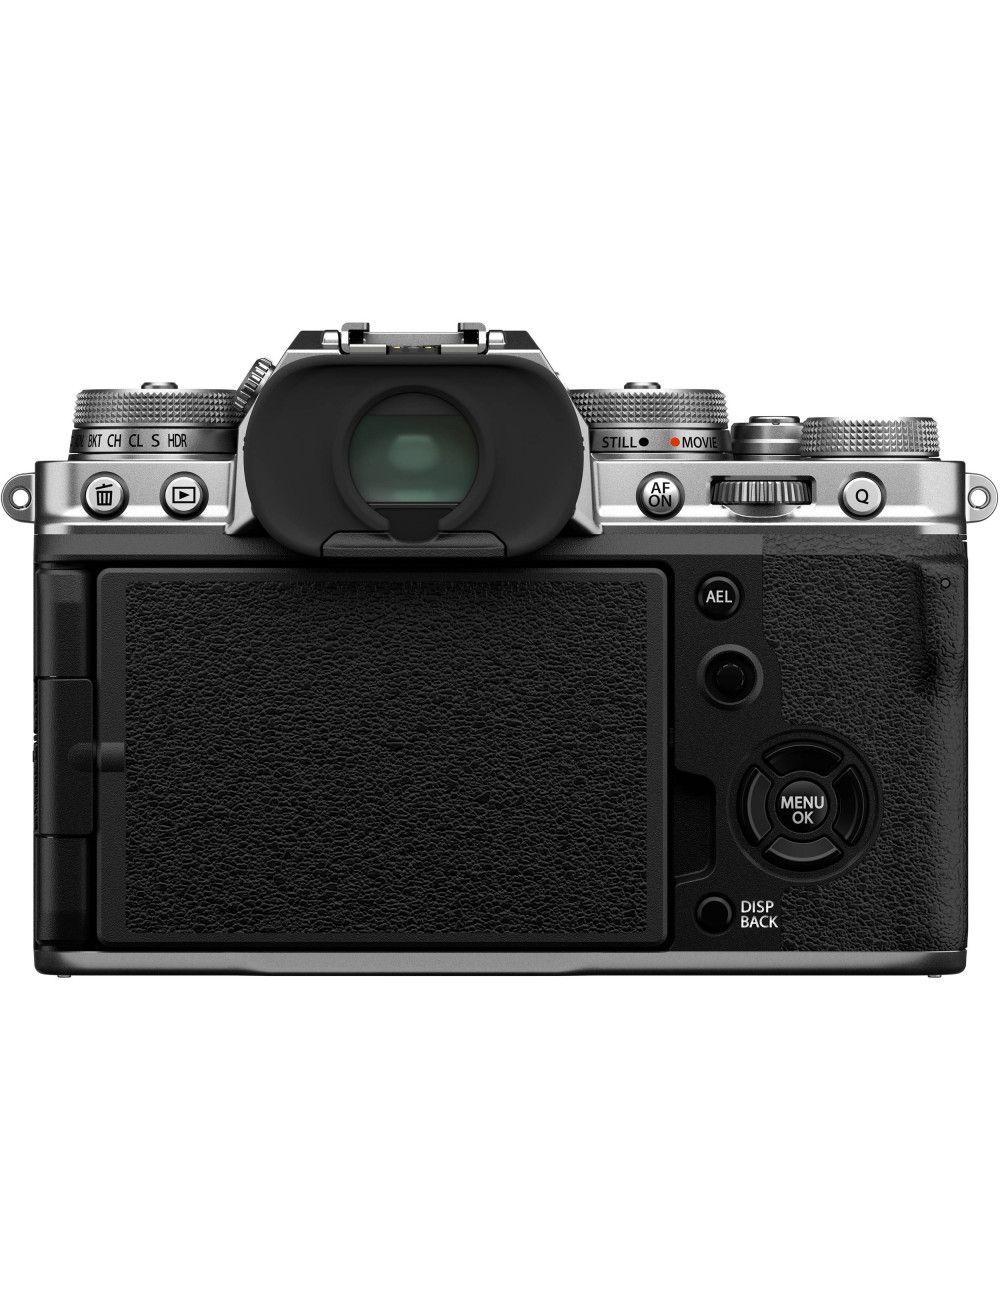 Lente Tamron 45mm 1.8 VC USD Di para Nikon